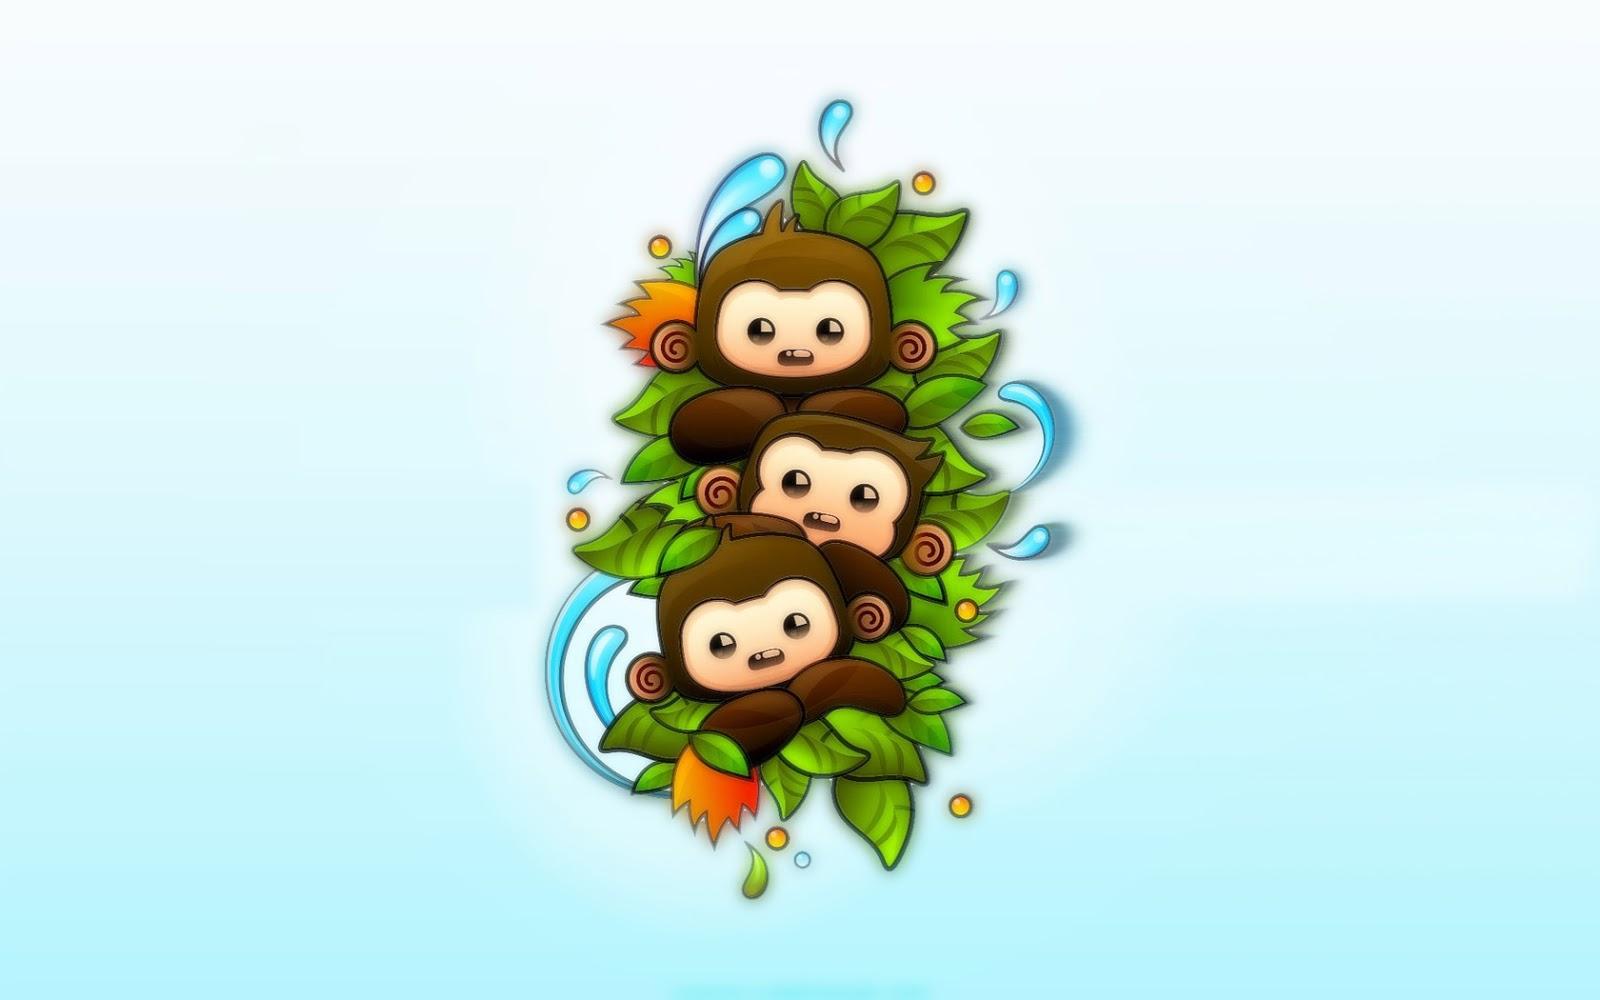 http://1.bp.blogspot.com/-fKUiVTwvmQU/UPF7VxjAi3I/AAAAAAAAAMQ/WXbTPpK7dfA/s1600/Kawaii_Monkey_Blue_by_chicho211680.jpg